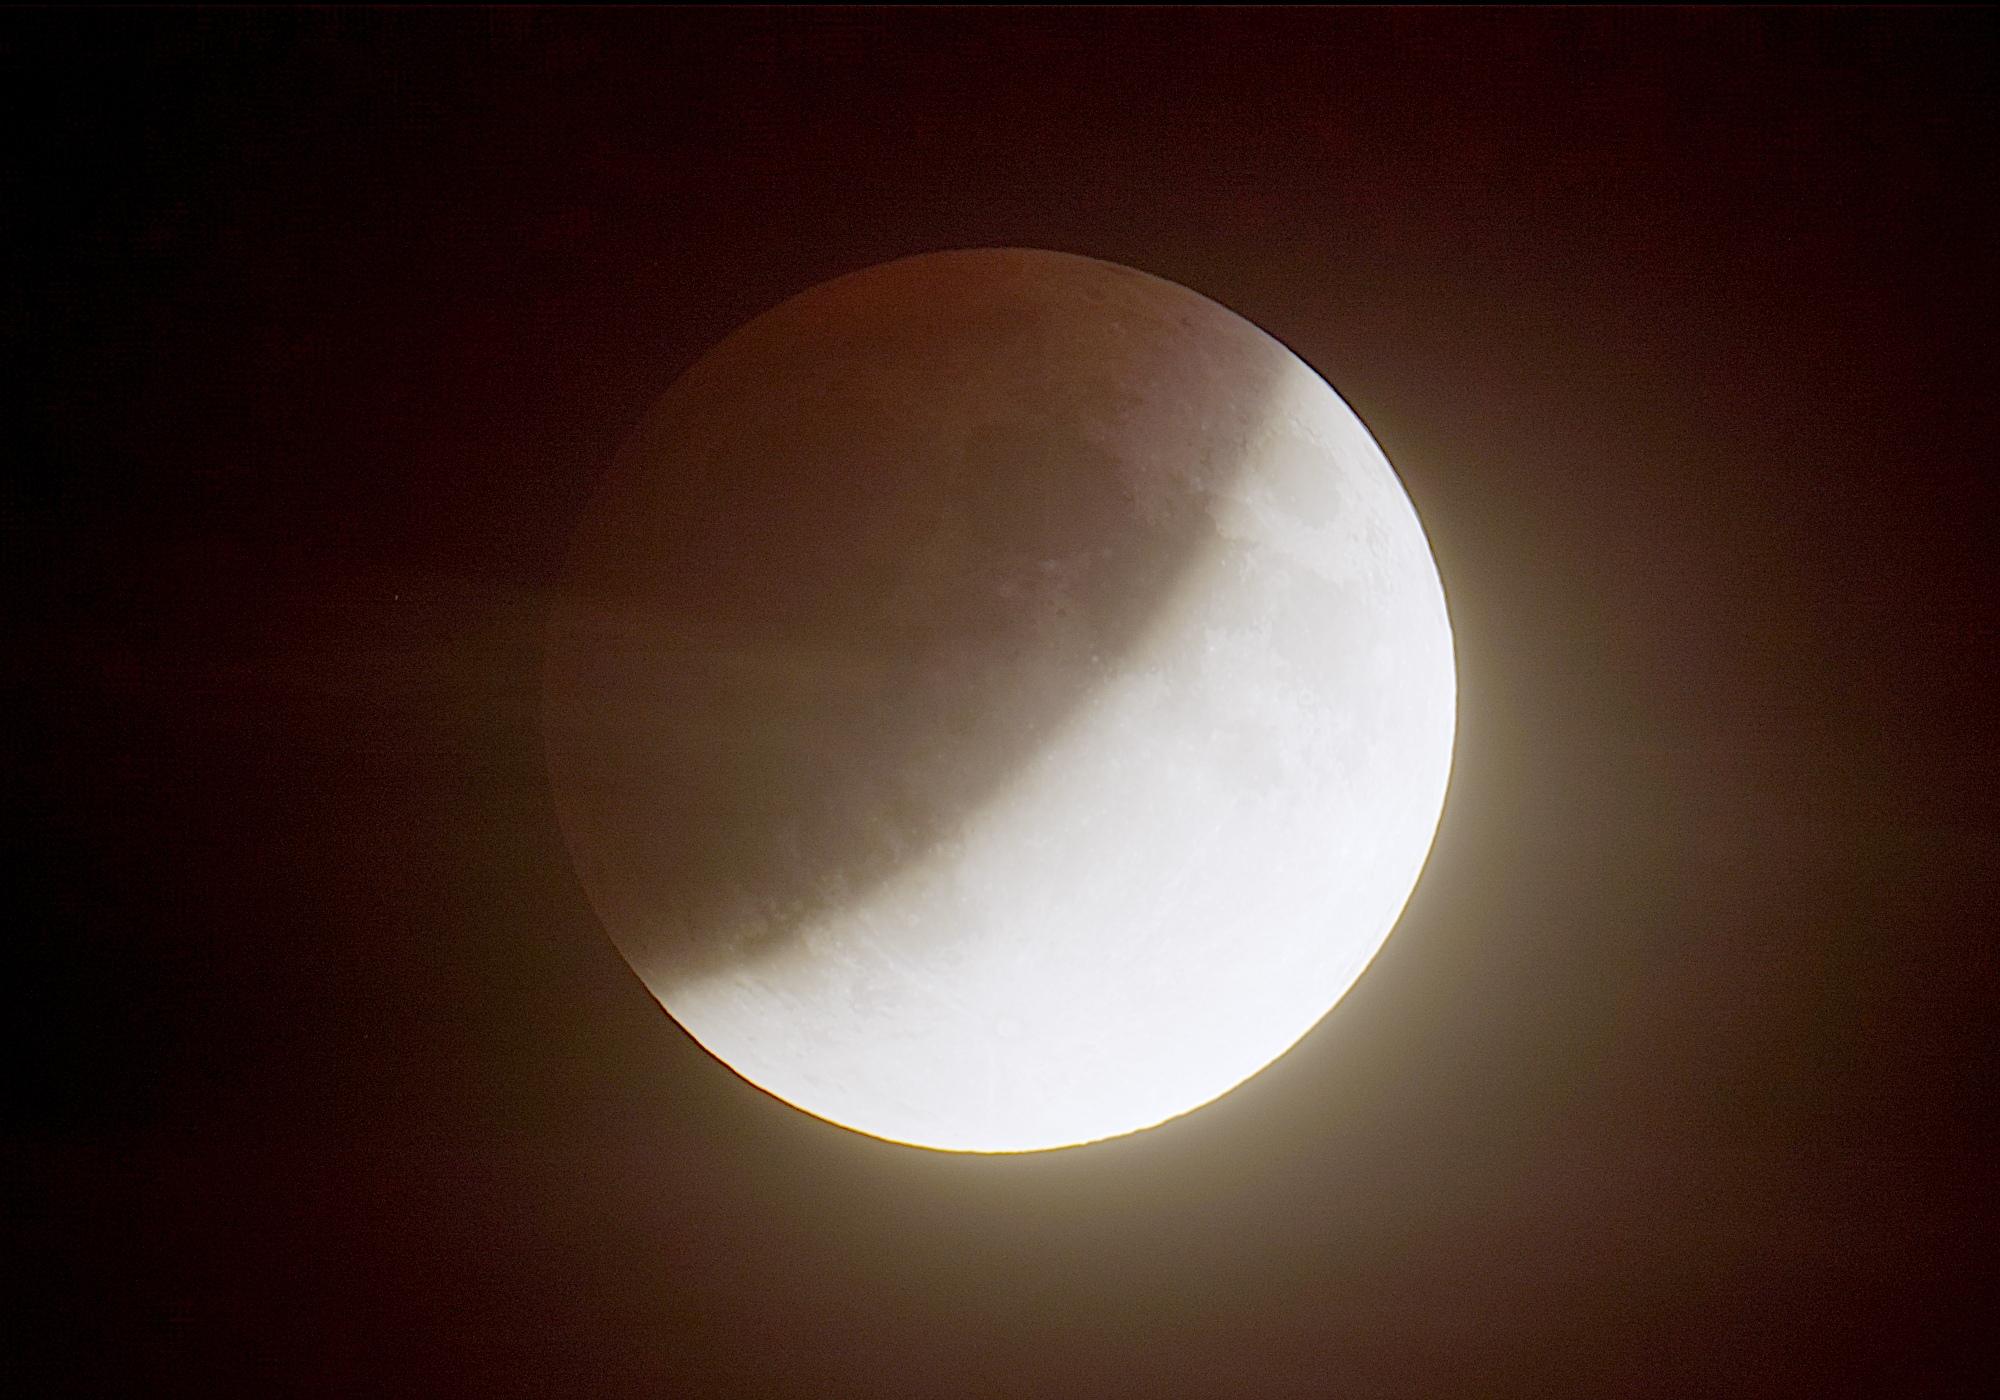 eclipselune-160719-21h00m46-t407f4bhdrlog.jpg.31e66b052e6b3ba72c43d845bfa0576e.jpg